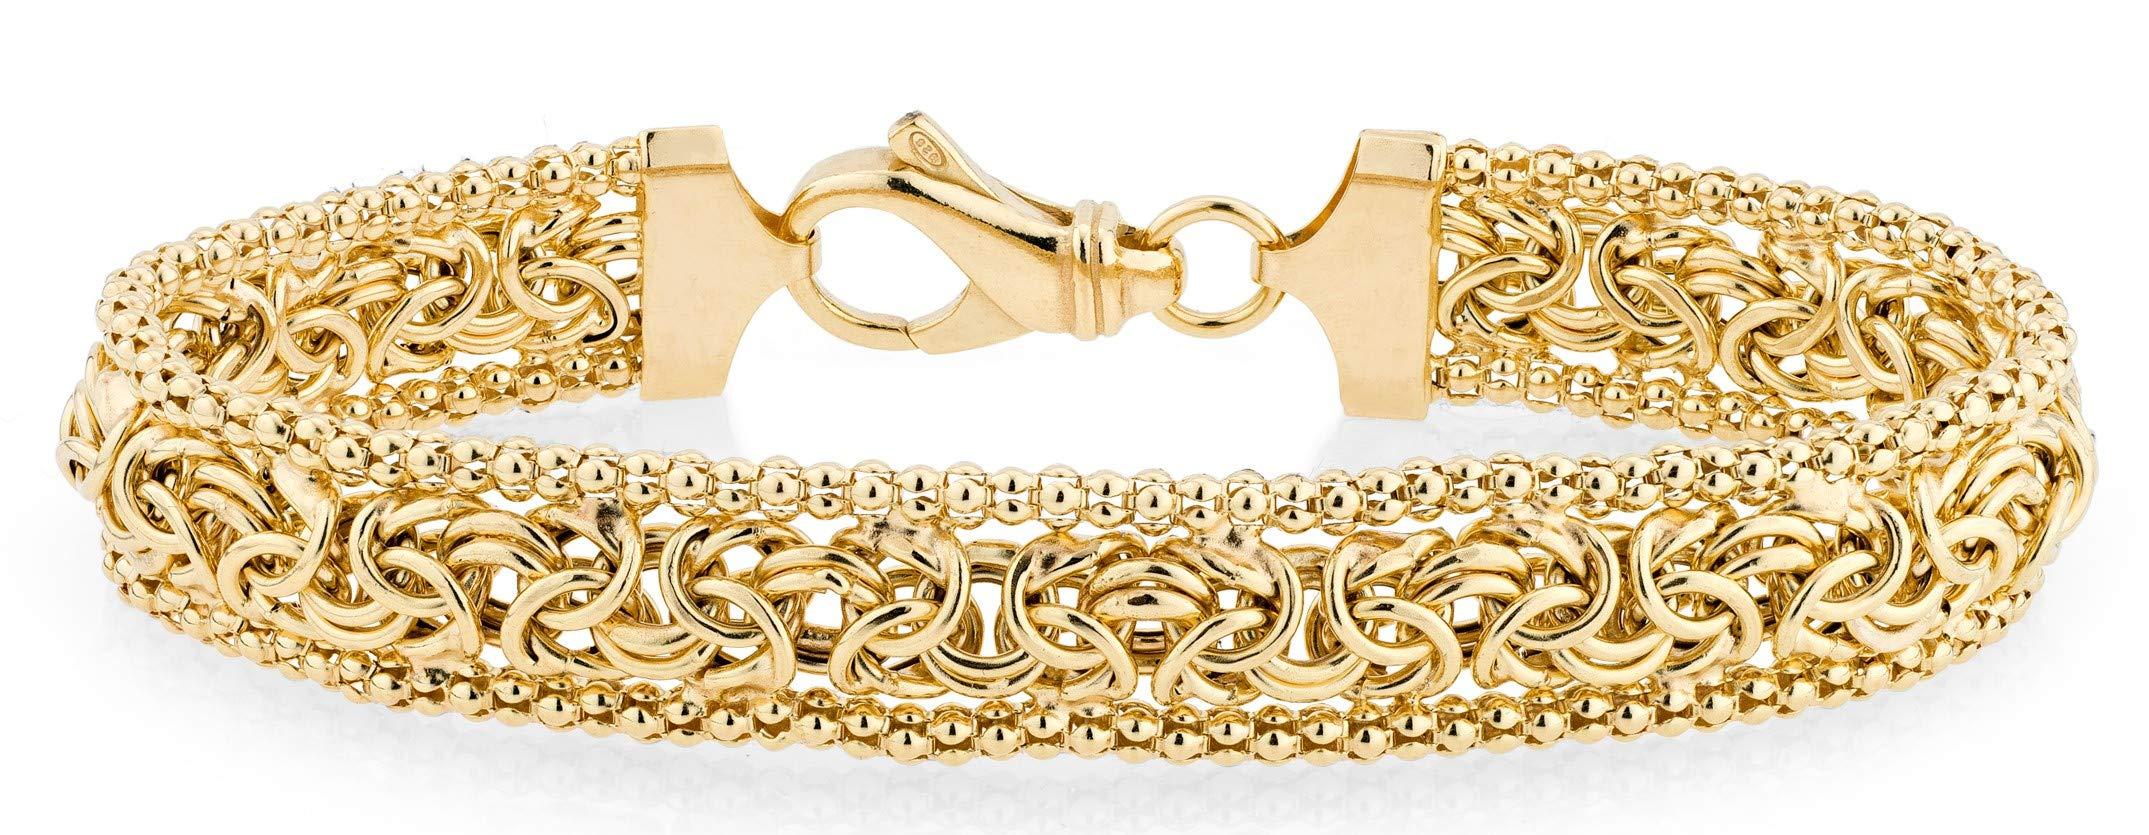 MiaBella 18K Gold Over Sterling Silver Italian Byzantine Beaded Mesh Link Chain Bracelet for Women, 6.5'', 7'', 7.5'', 8'' 925 Italy (8.00)